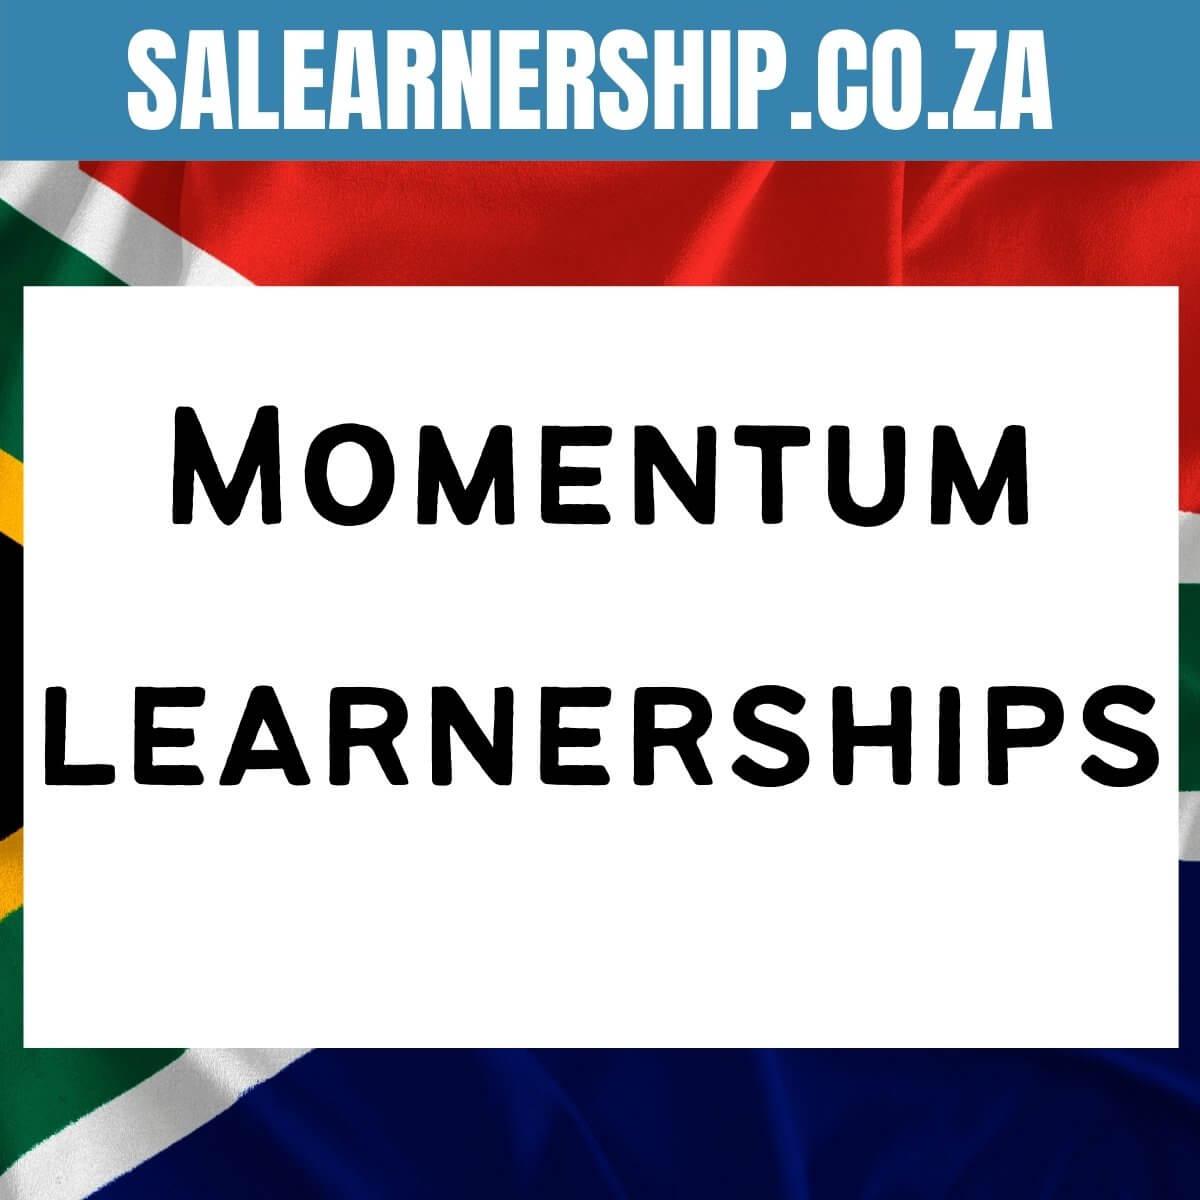 Momentum learnerships